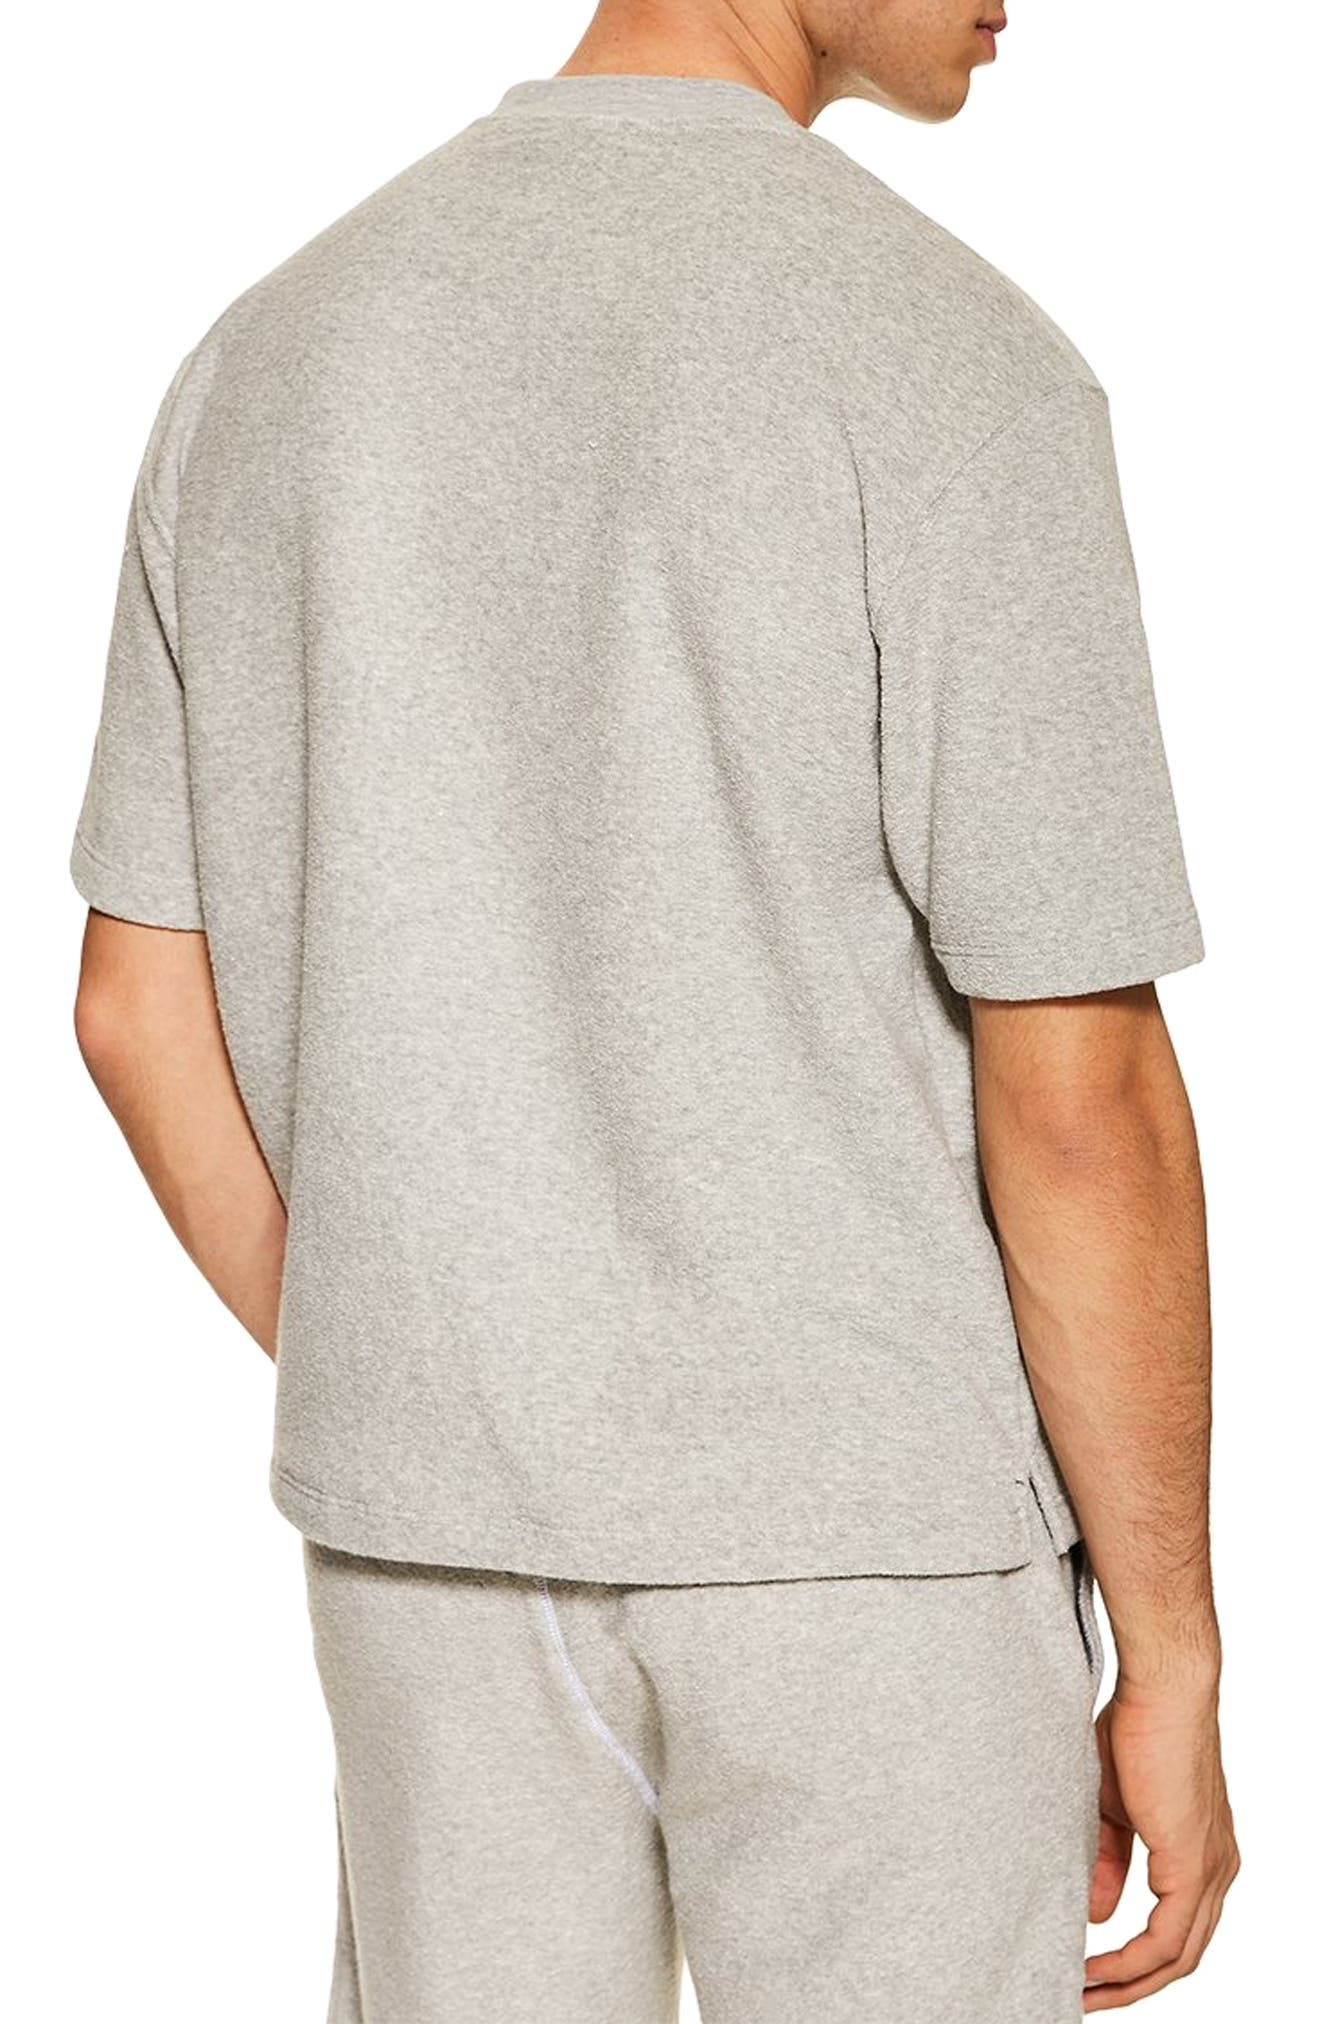 TOPMAN, Short Sleeve Terry Sweatshirt, Alternate thumbnail 2, color, GREY